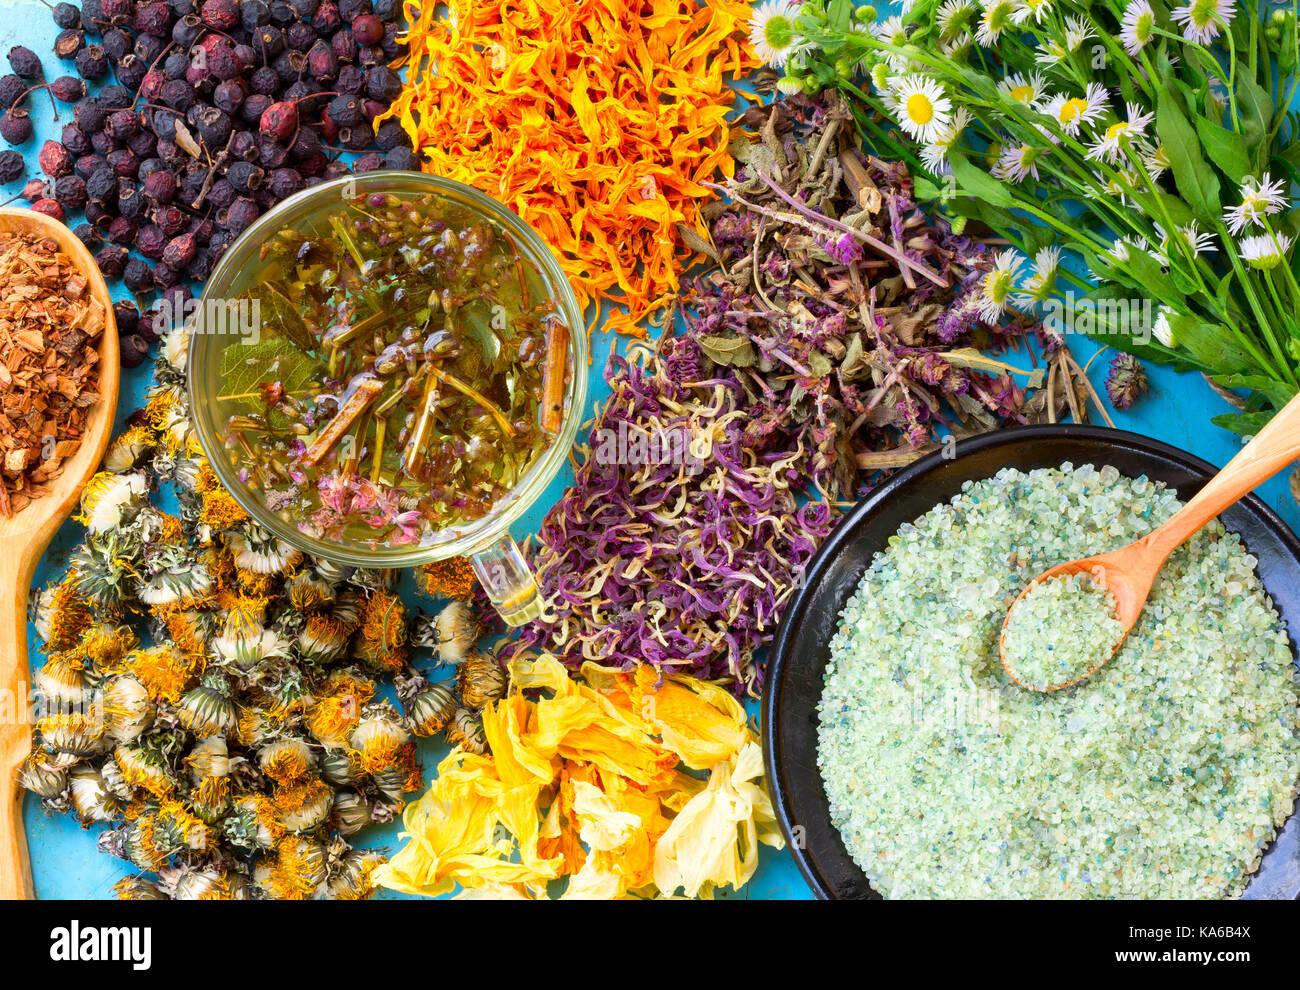 Hot herbal tea, a set of dried flowers and berries, herbs, oak bark, sea salt on old wooden table. Alternative medicine, Stock Photo